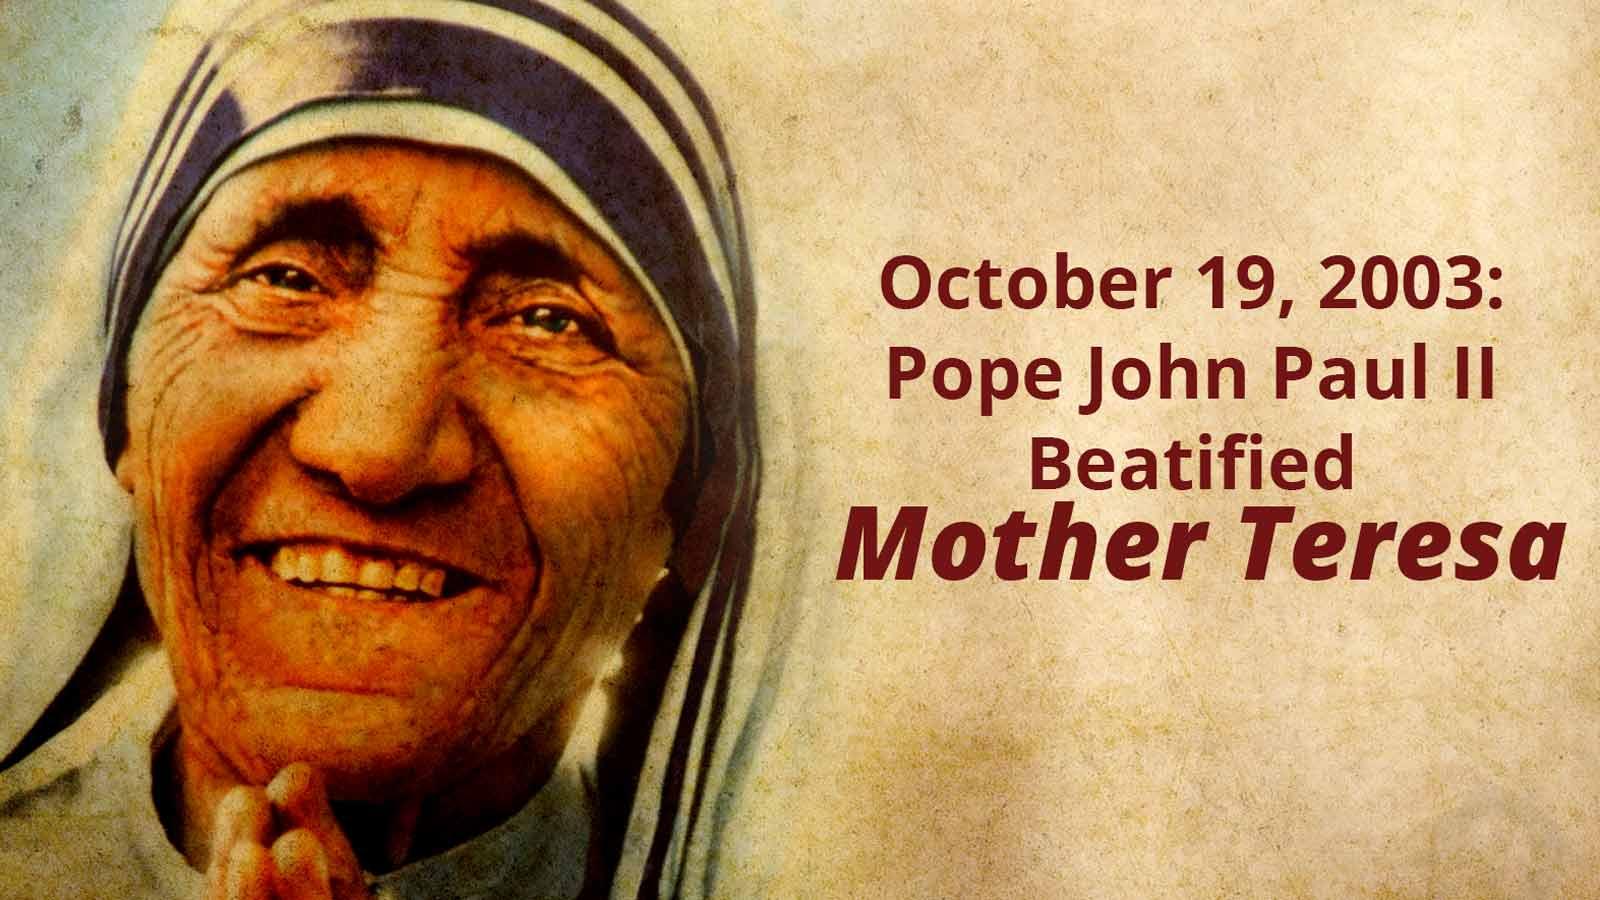 october-19-2003-pope-john-paul-ii-beatified-mother-teresa